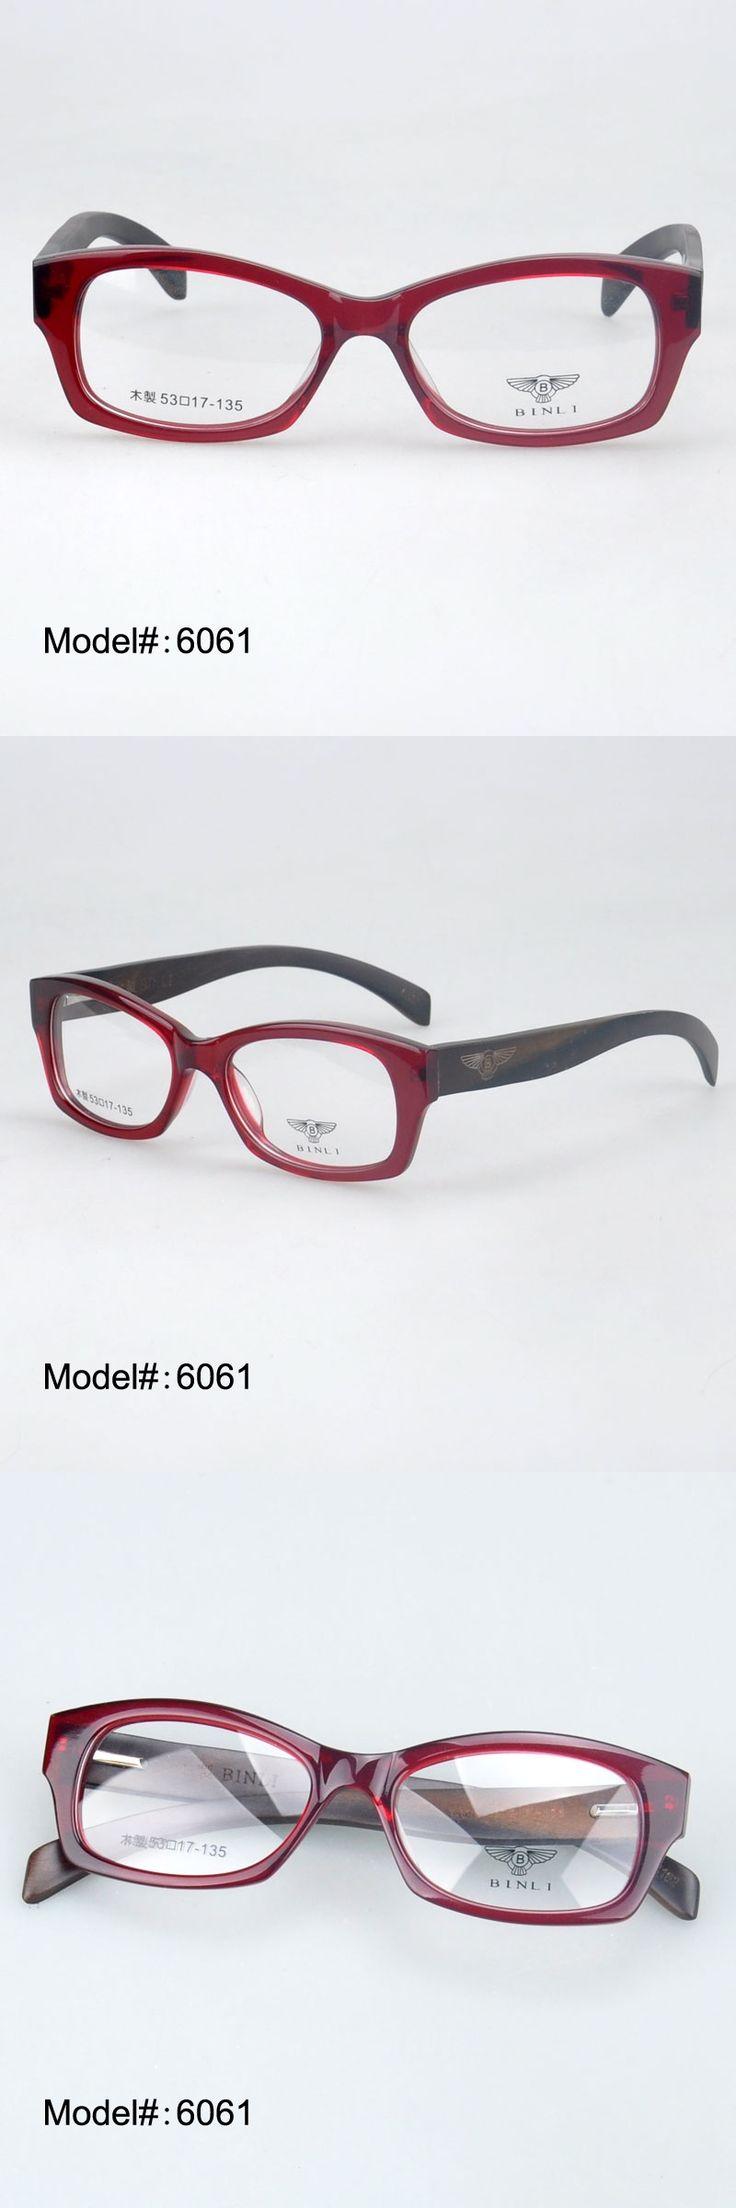 MY DOLI 6061 spring hinge full rim fashionable acetate frame wooden temple optical frames eyewear glasses myopia spectacles